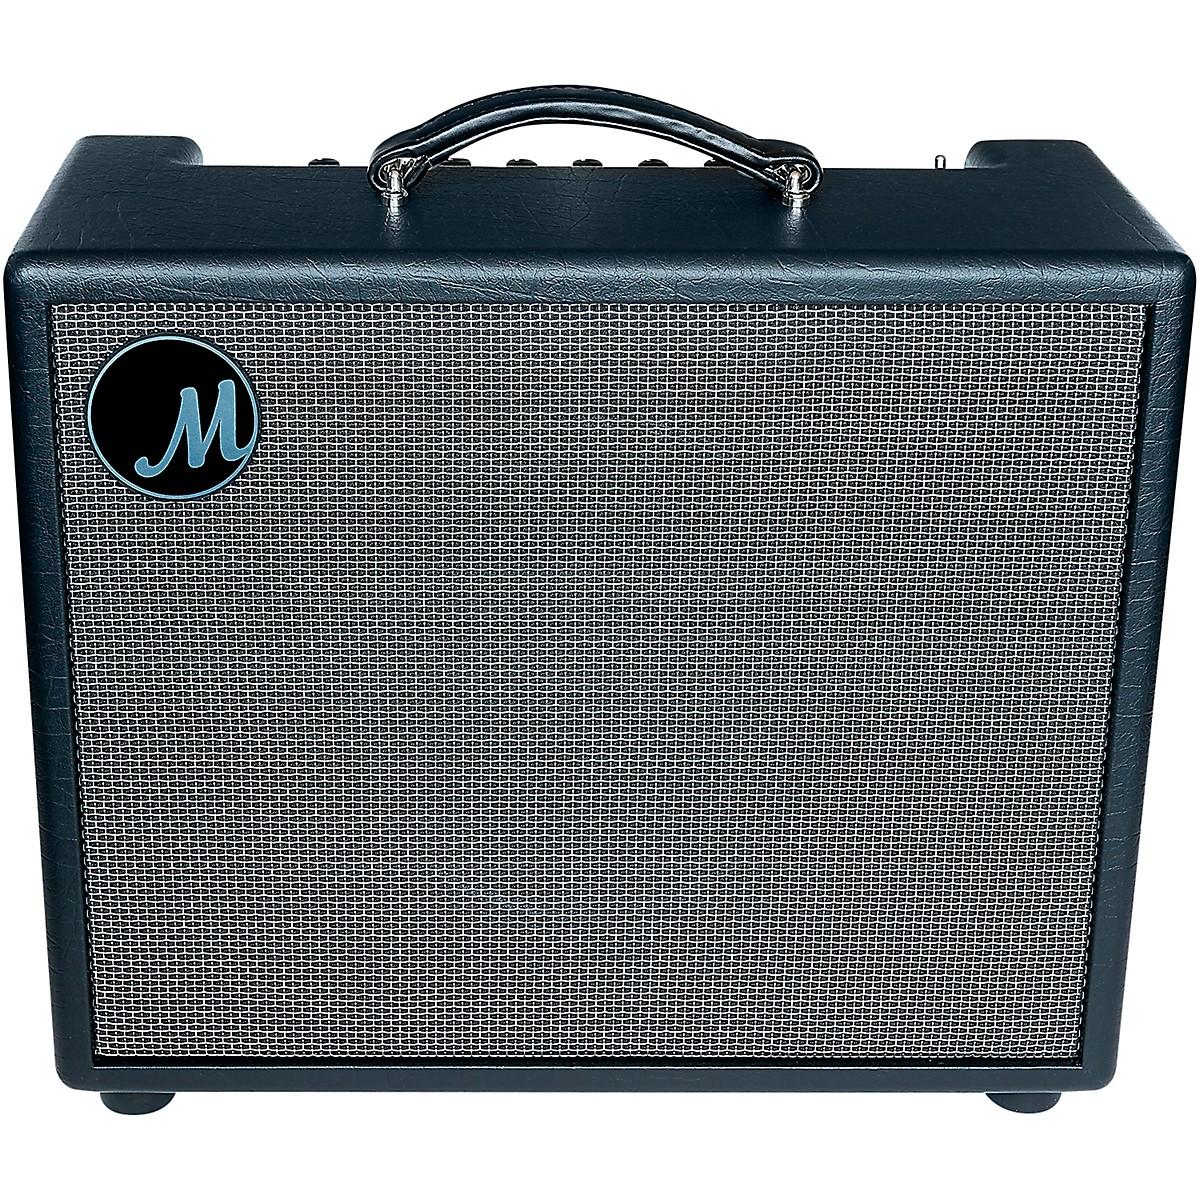 Milkman Sound The Amp 50W 1x12 Guitar Combo Amplifier